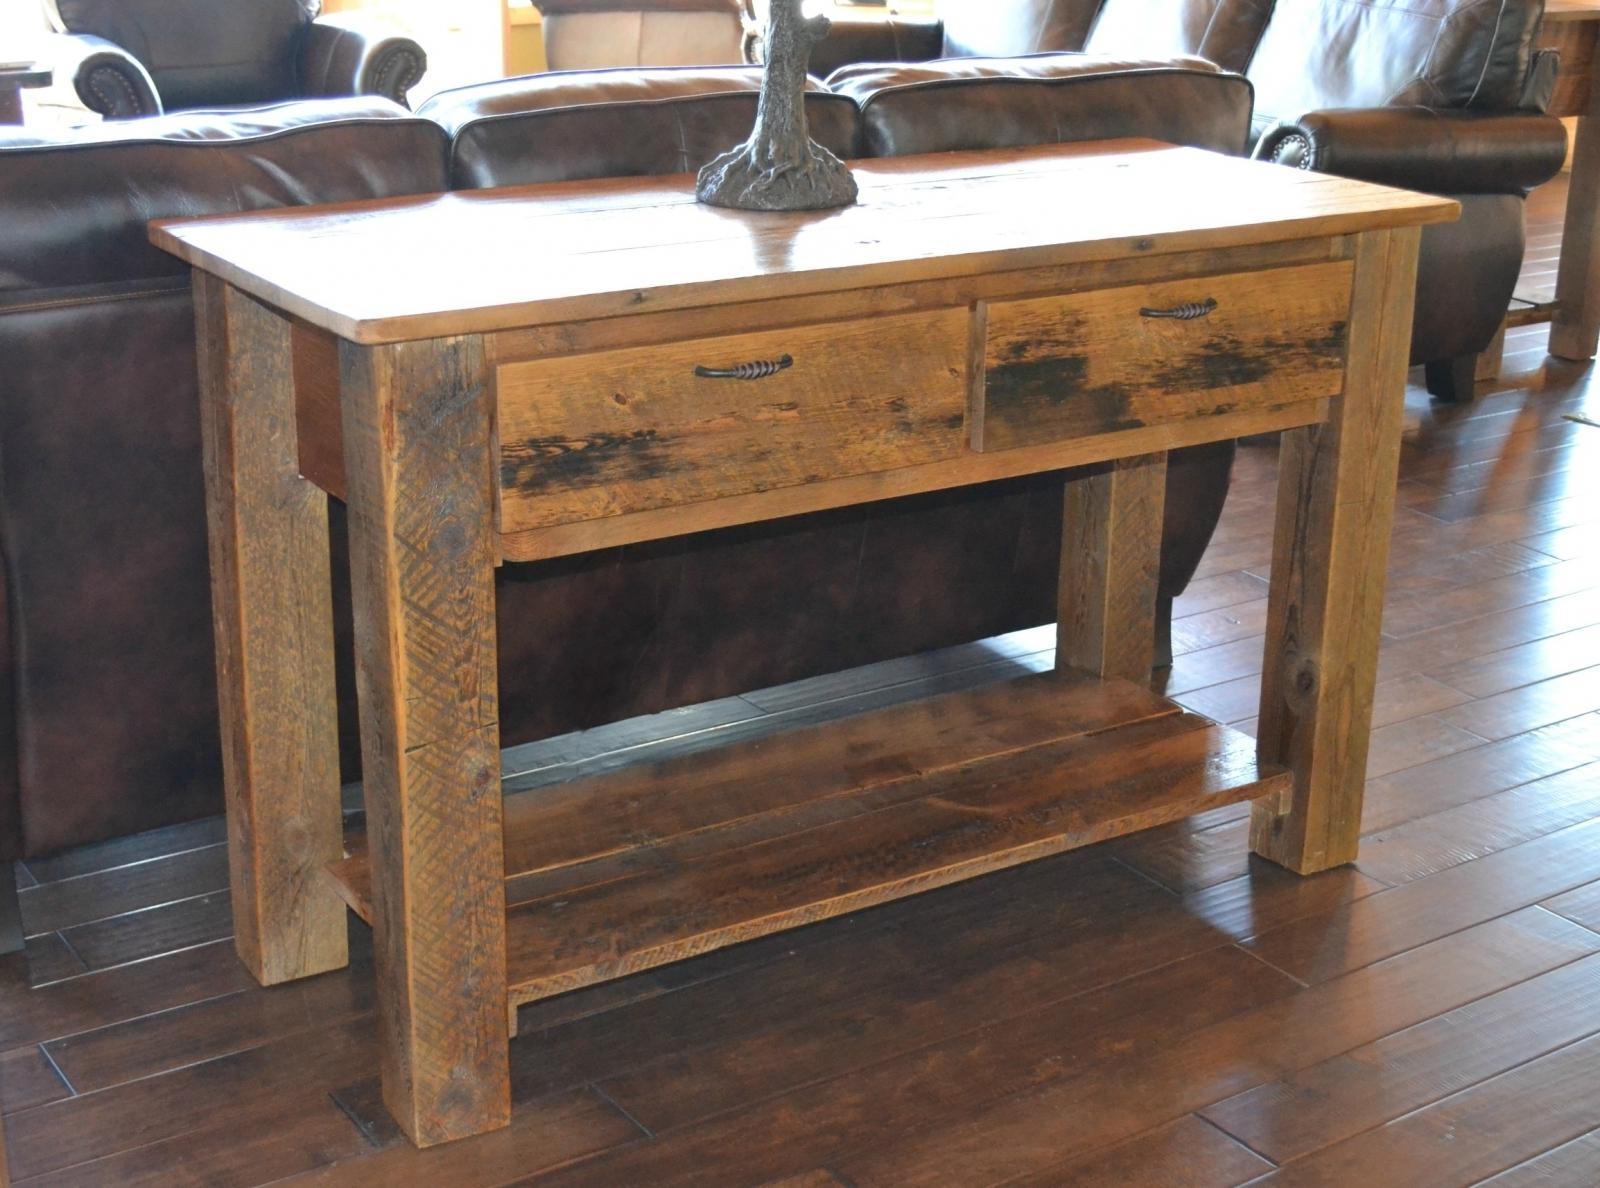 Barnwood Sofa Table | Sofa Gallery | Kengire With Barnwood Sofa Tables (View 8 of 20)